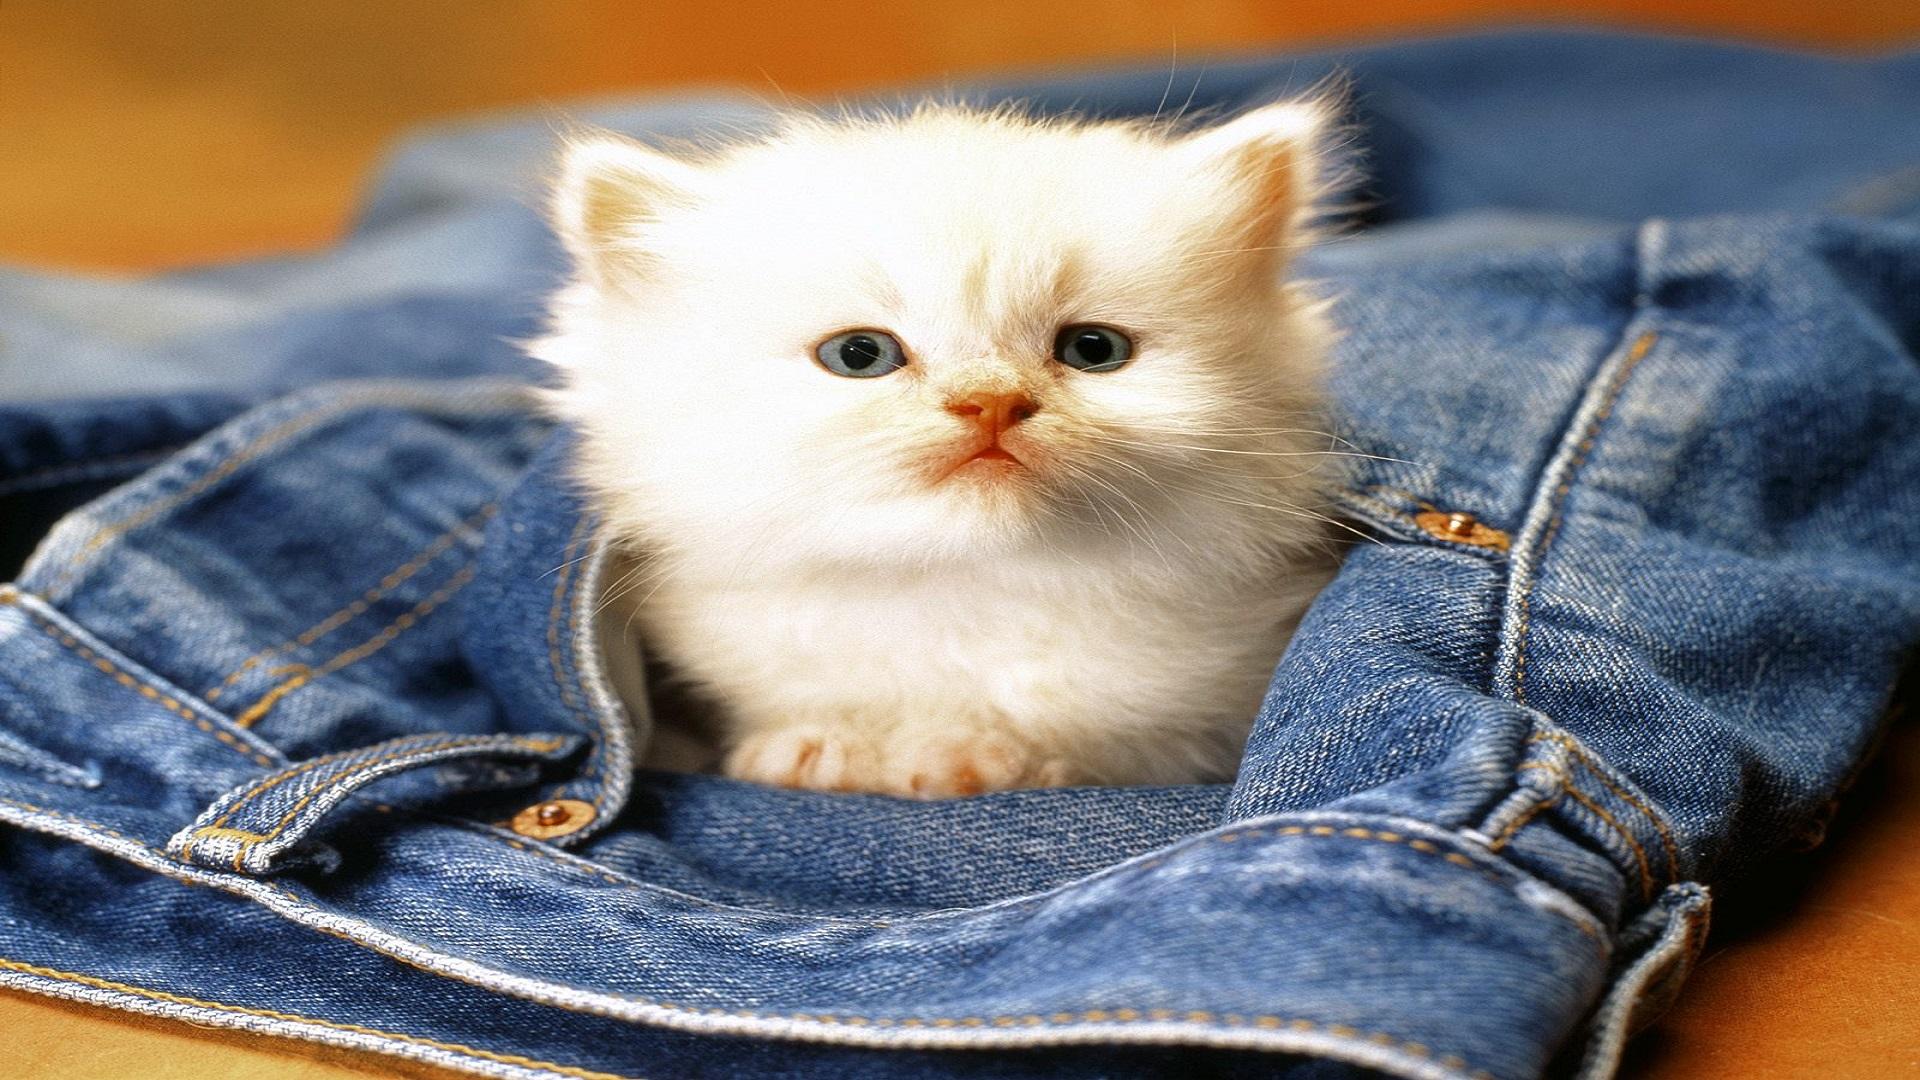 Beautiful Cats Free Hd Wallpapers For Desktops Hd Wallpaper